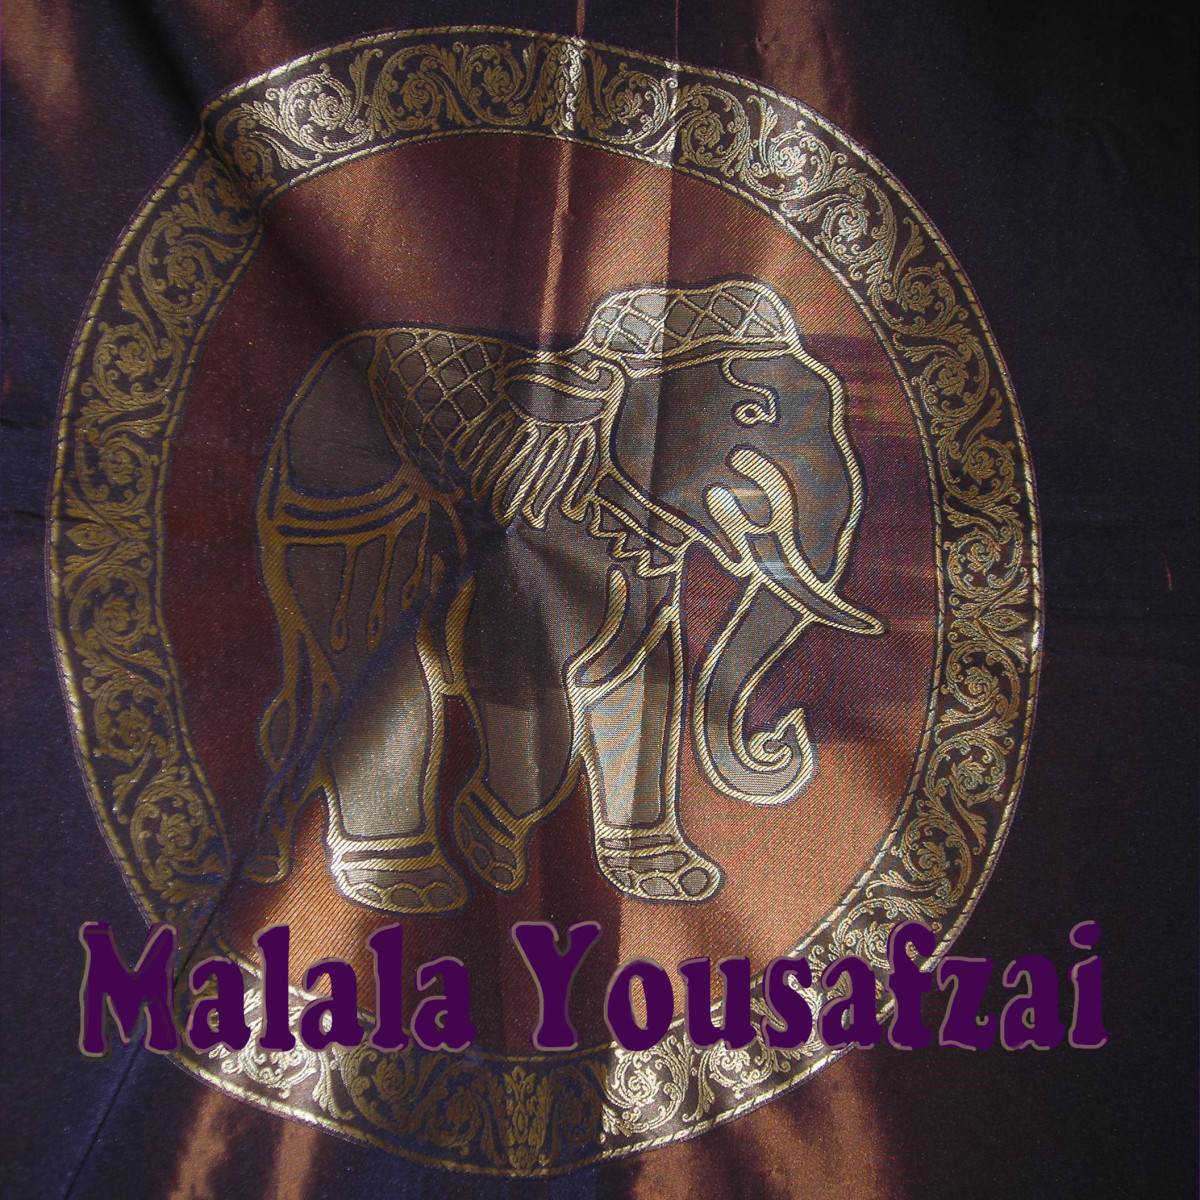 Malala Yousafzai (The Pakistani Girl Shot for Defying the Taliban), Nobel Prizewinner - my Poem